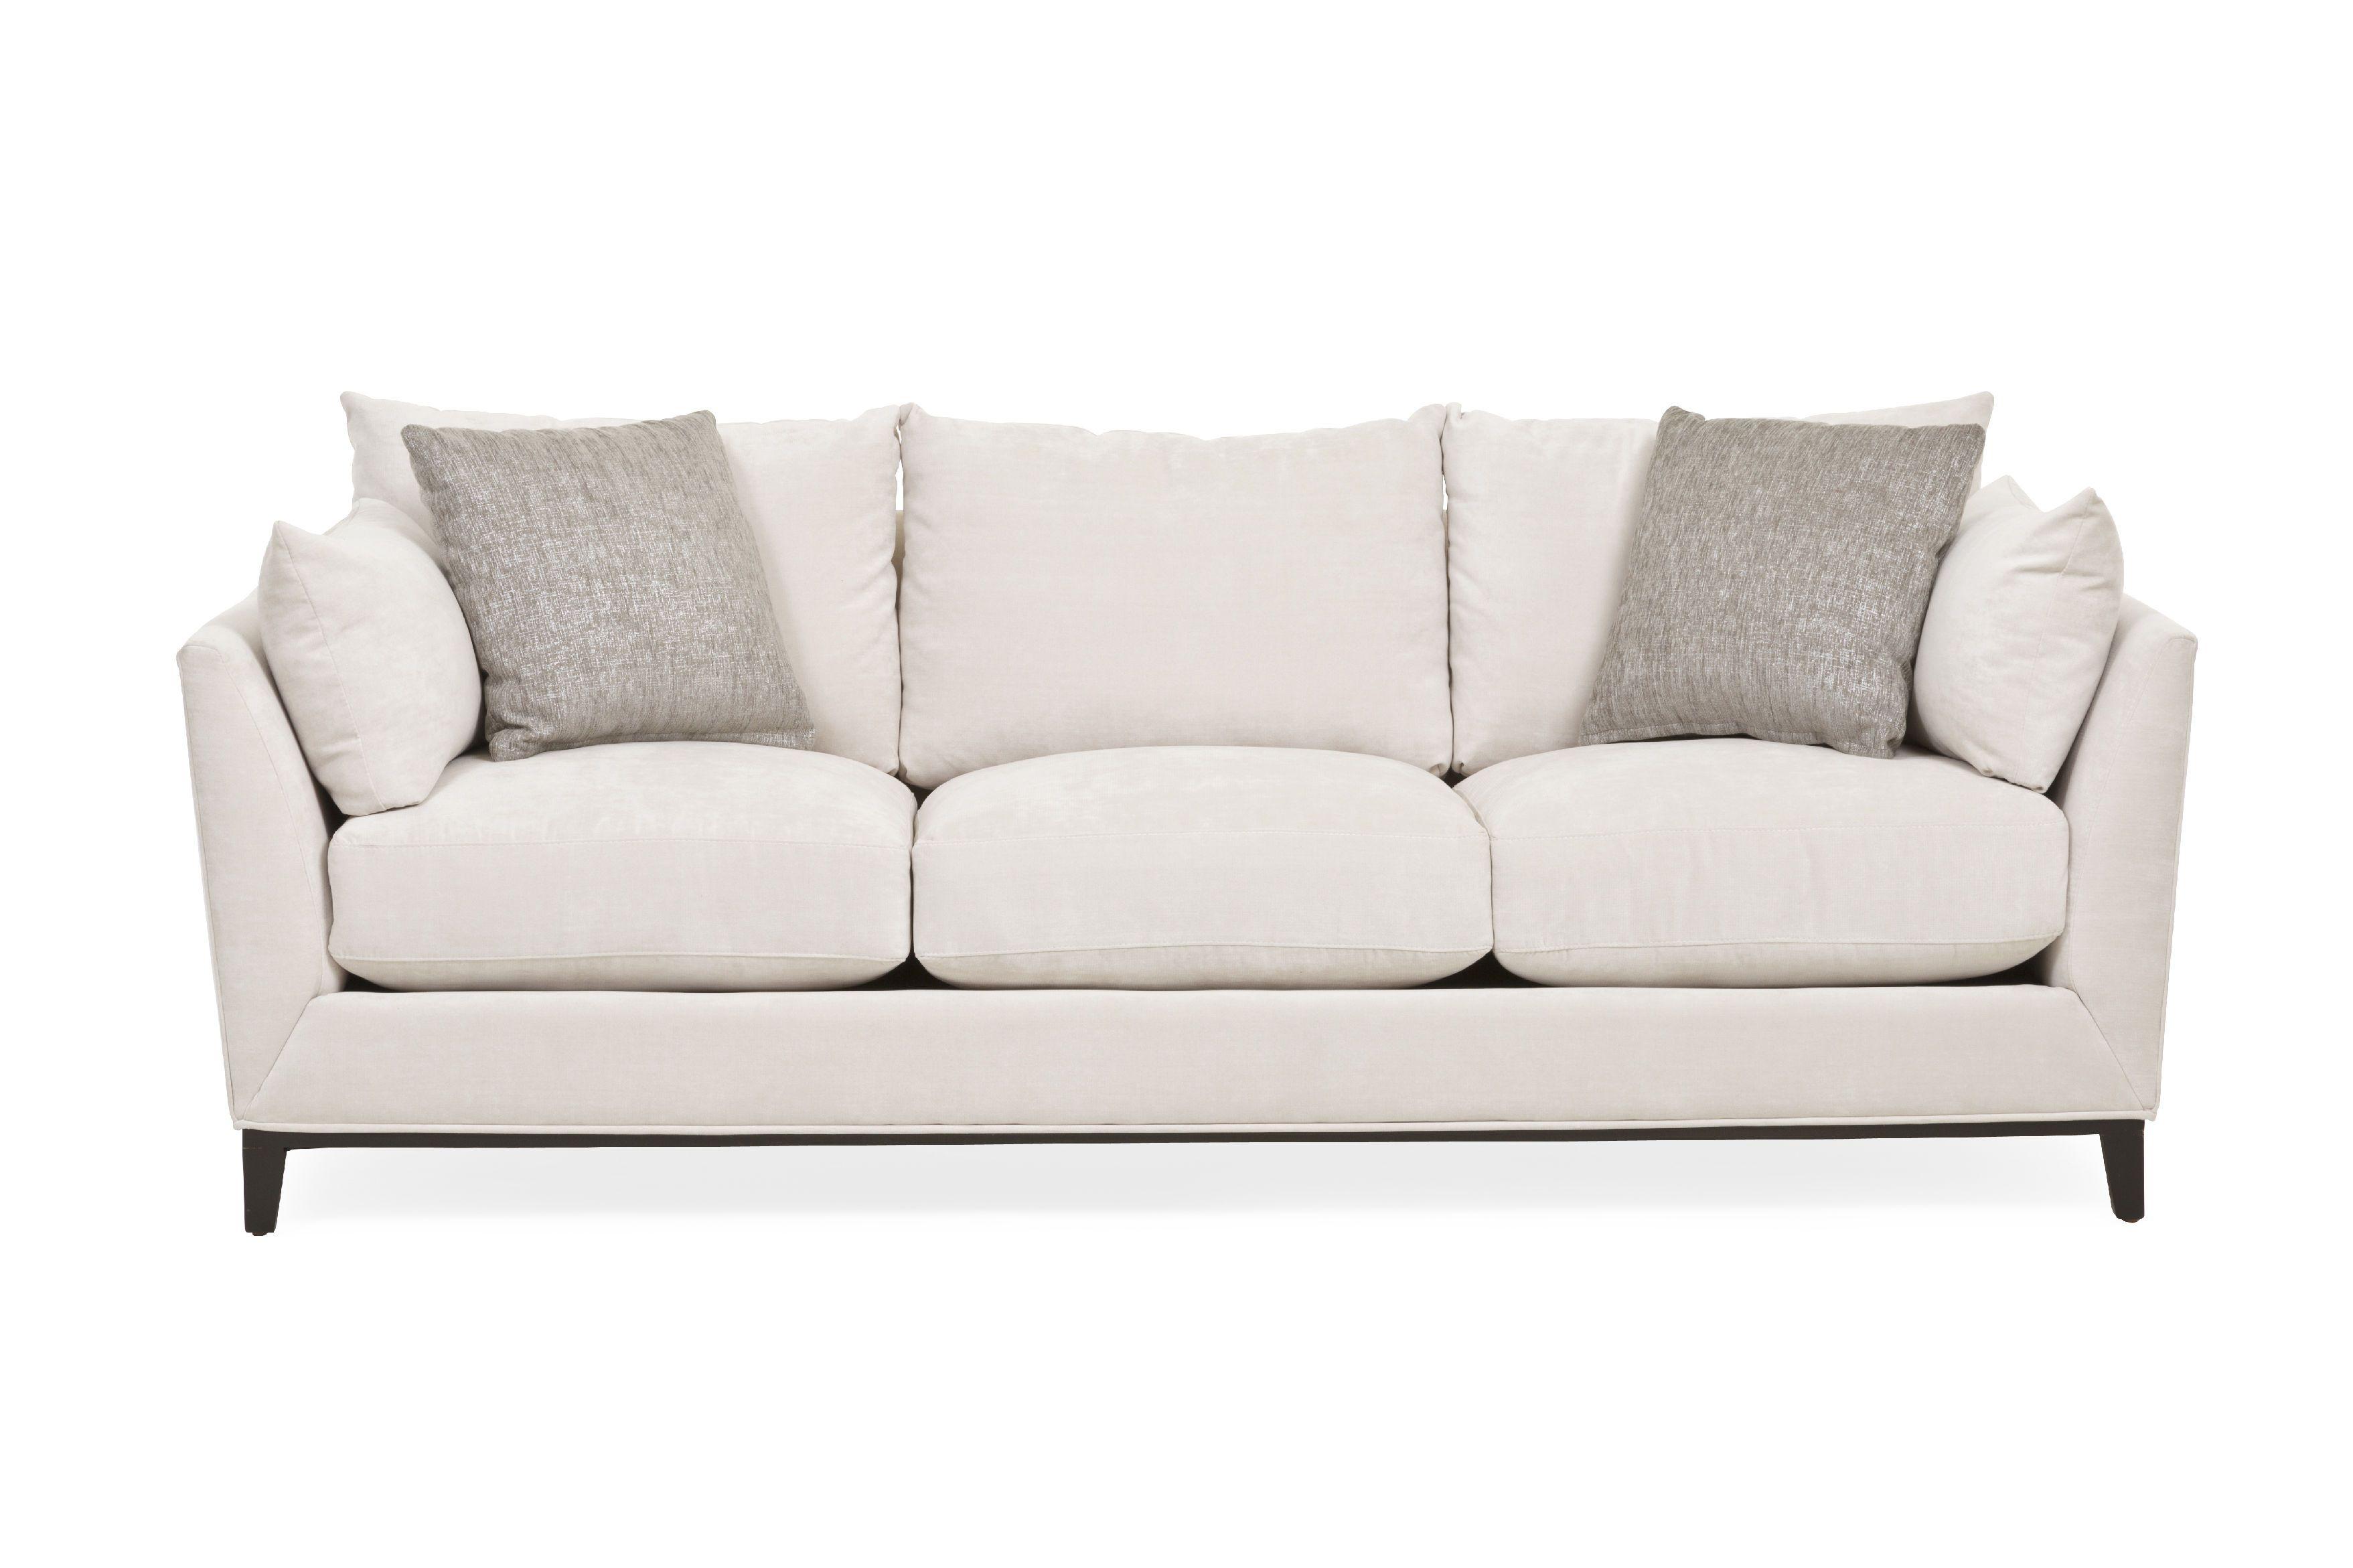 Star Furniture Sofas Teal Velvet Sofa Metro St 423218 940 Apartment